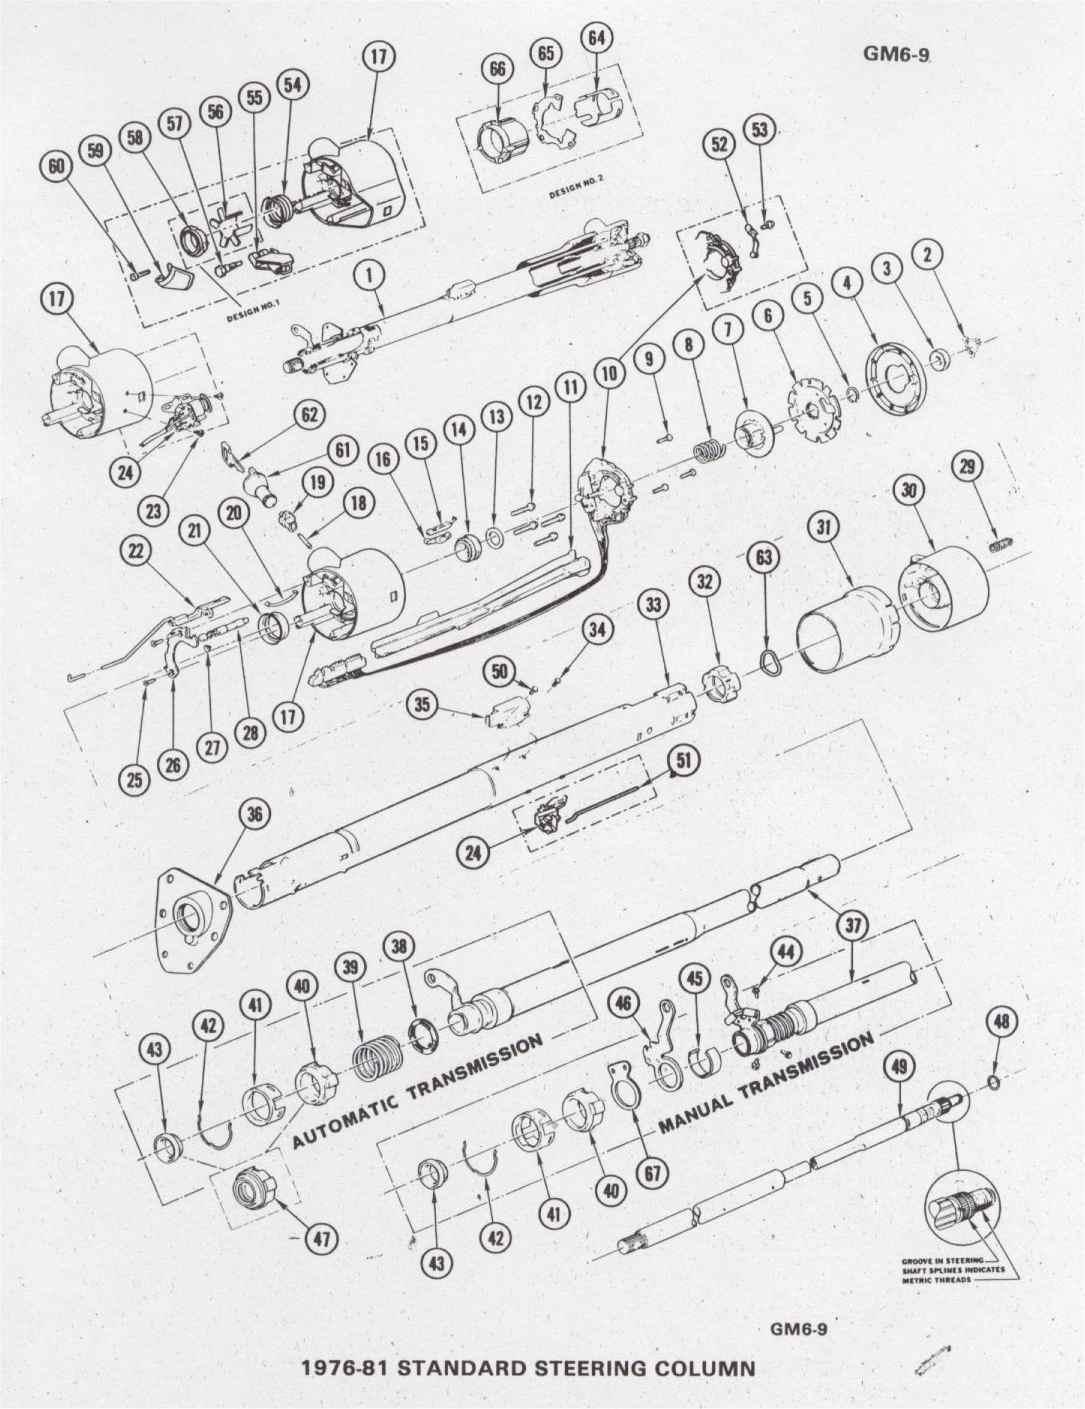 hight resolution of 1972 chevy steering column parts diagram house wiring diagram 1985 corvette steering column diagram c4 corvette